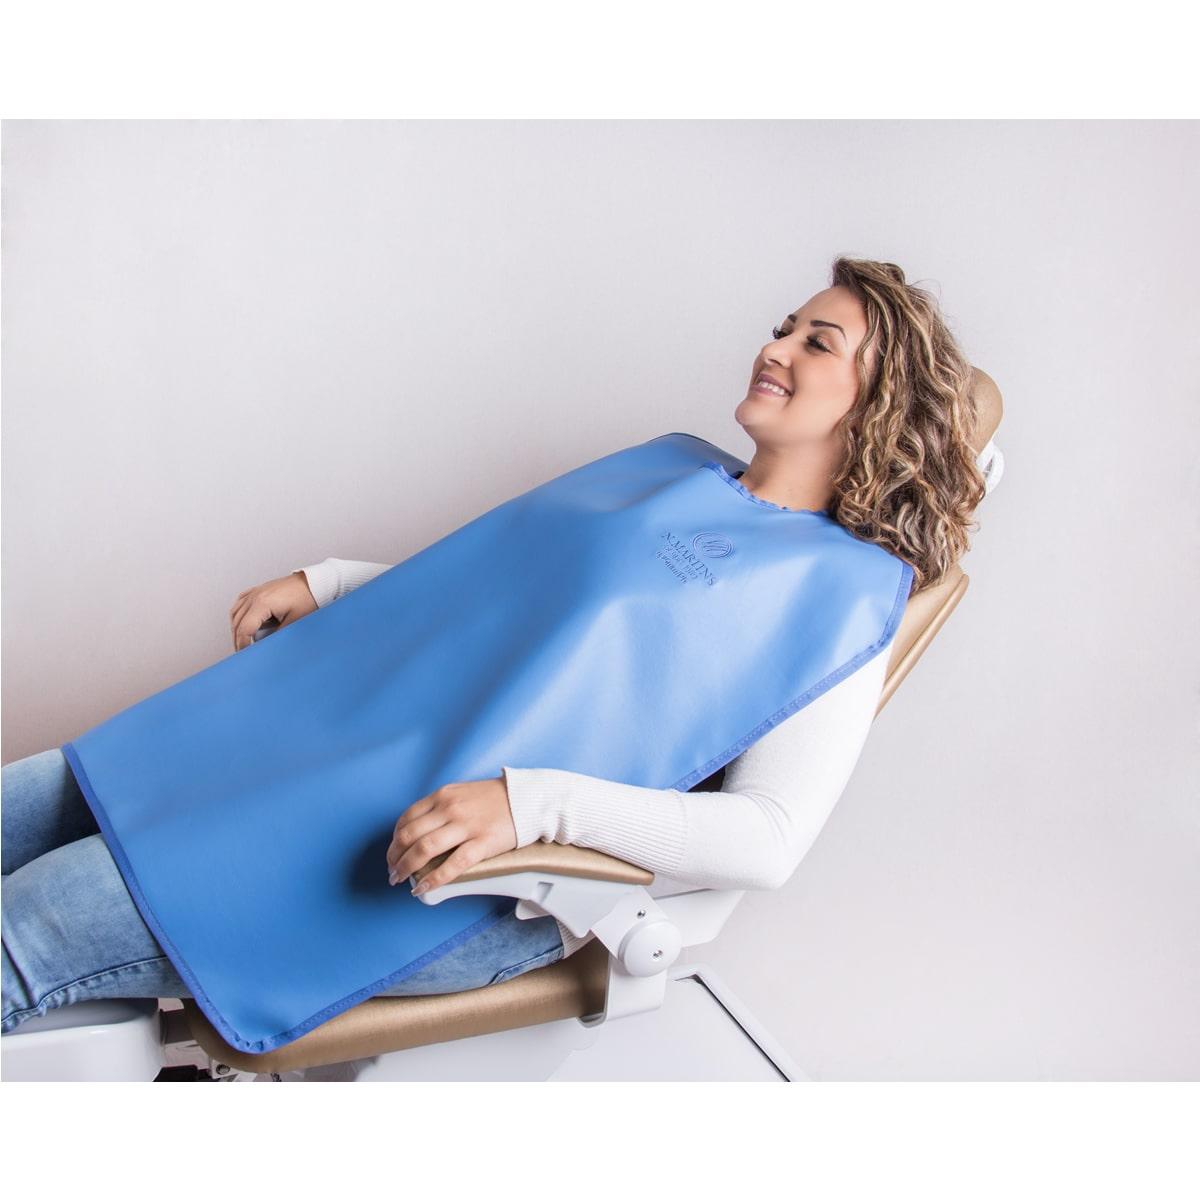 Avental Periapical sem protetor de tireoide - 76x60cm - 0,25mm/Pb - N.Martins